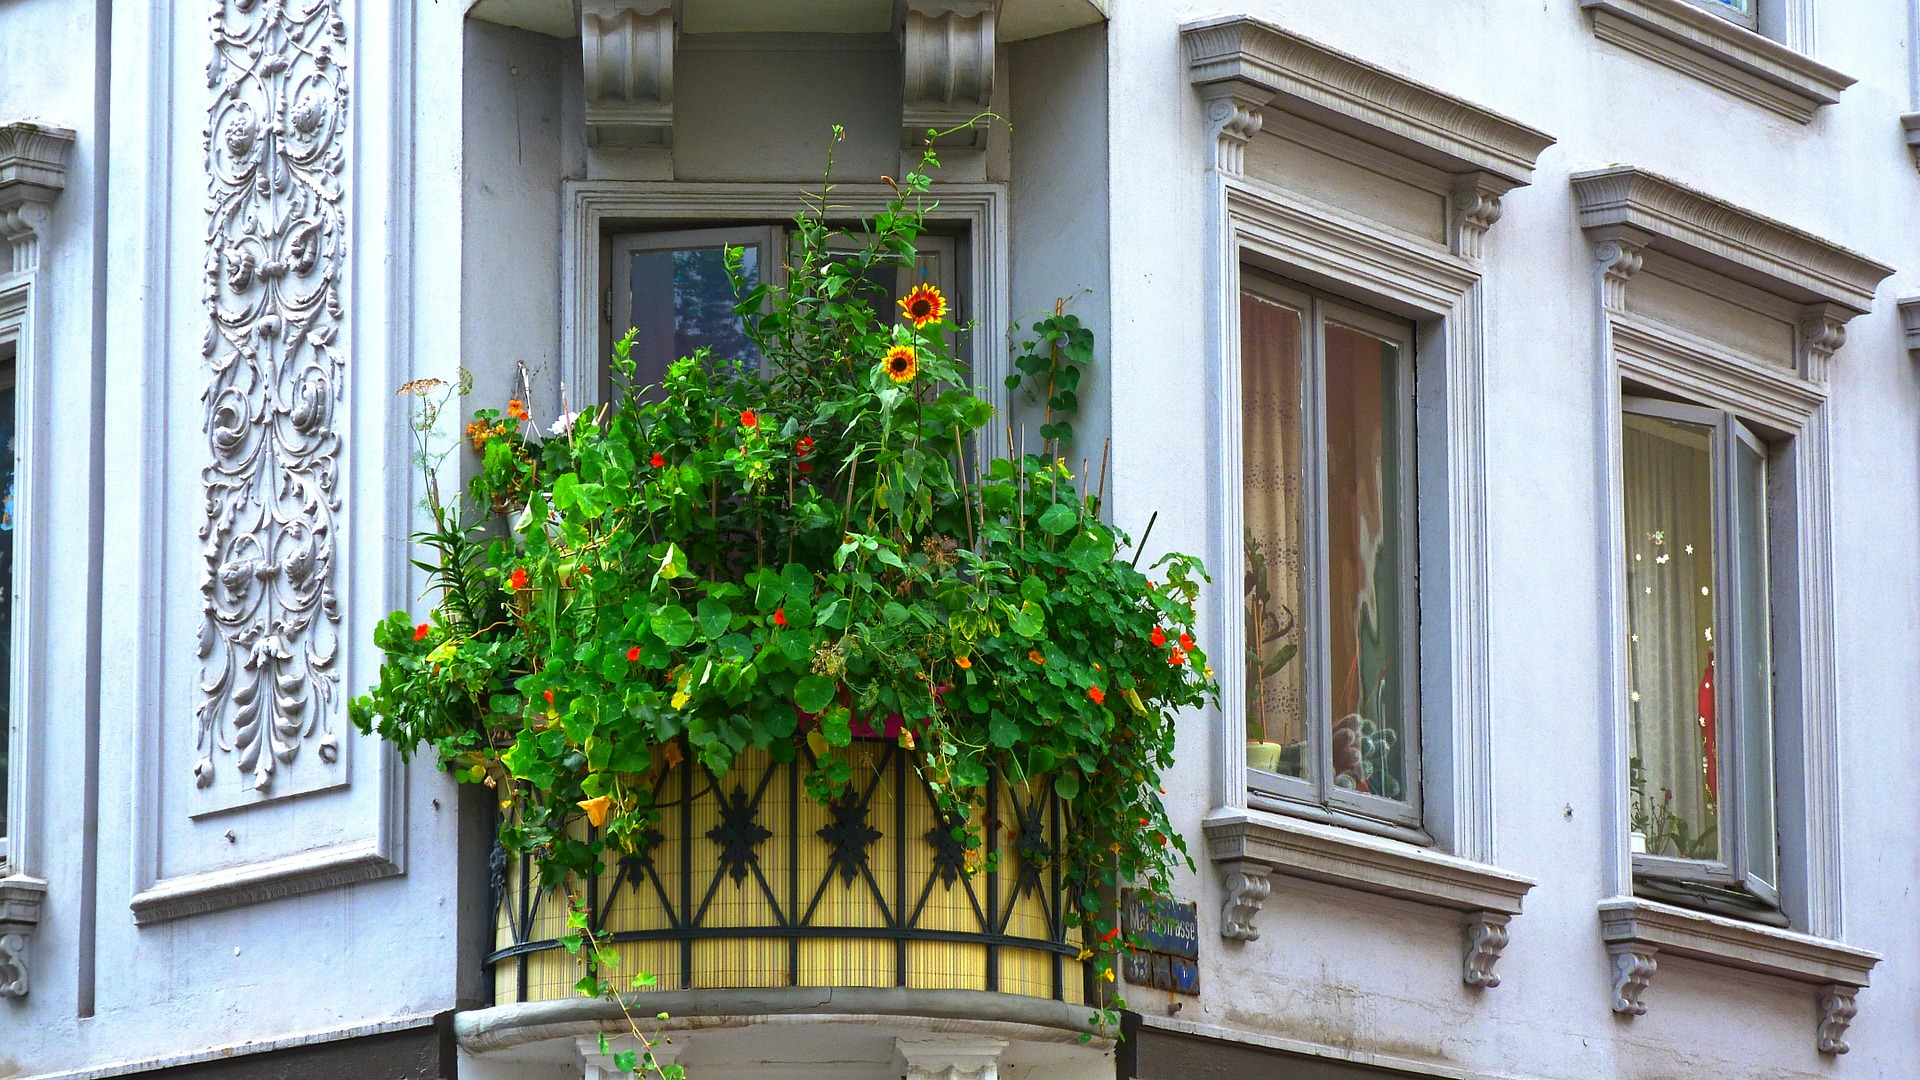 Balcony gardening in UK. Gardening trends 2020.